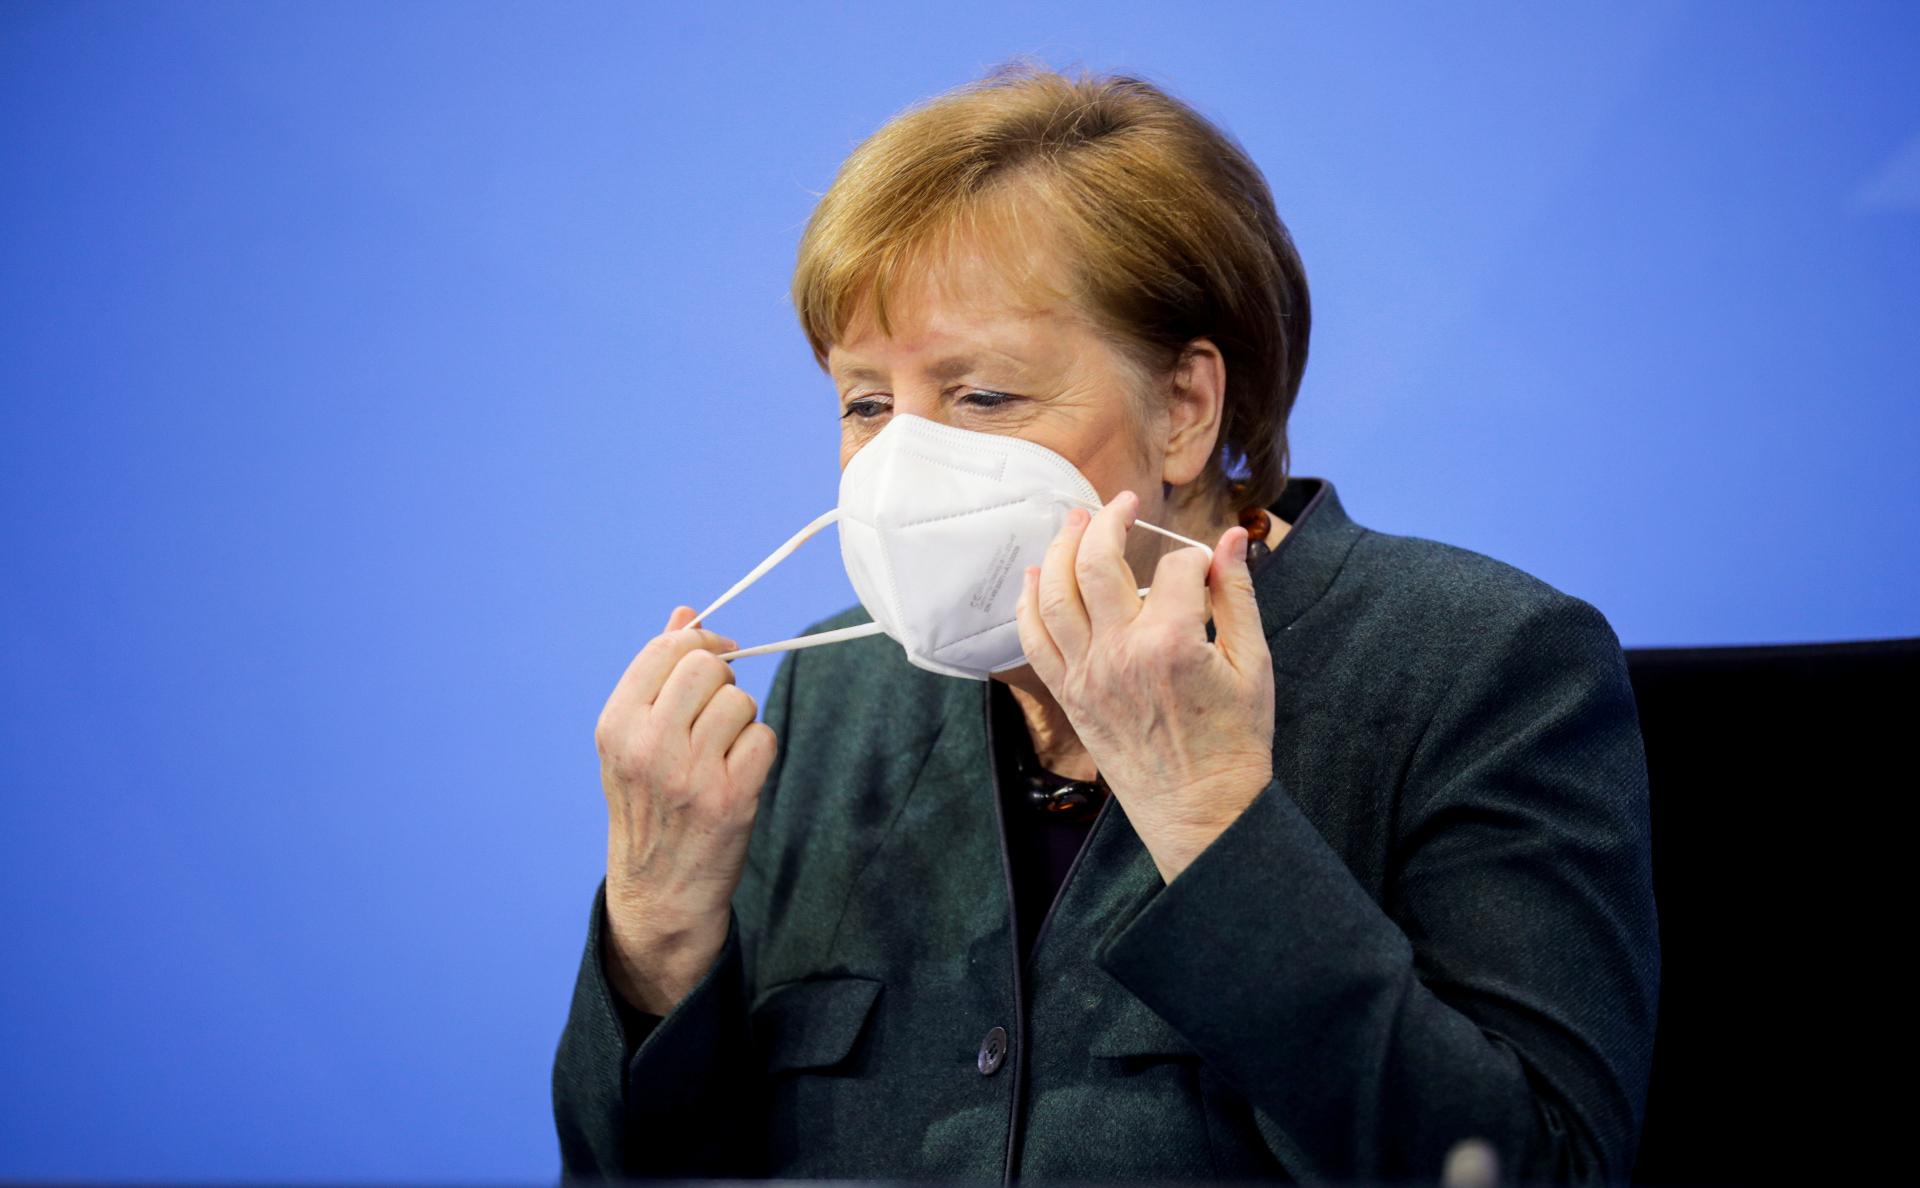 Меркель объявила о продлении карантина до Дня святого Валентина